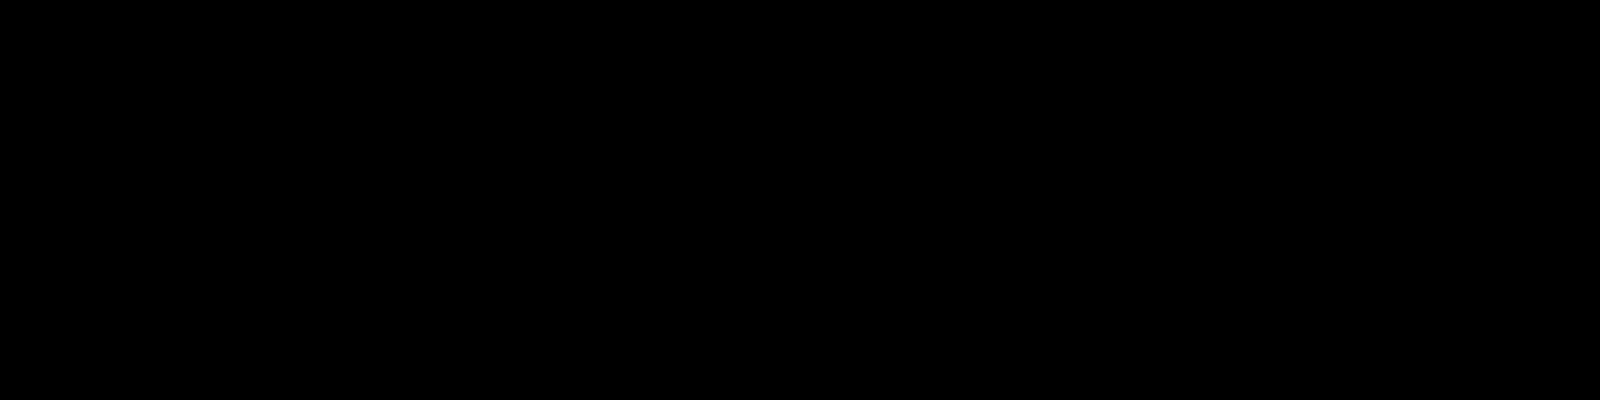 WIDYARINI29